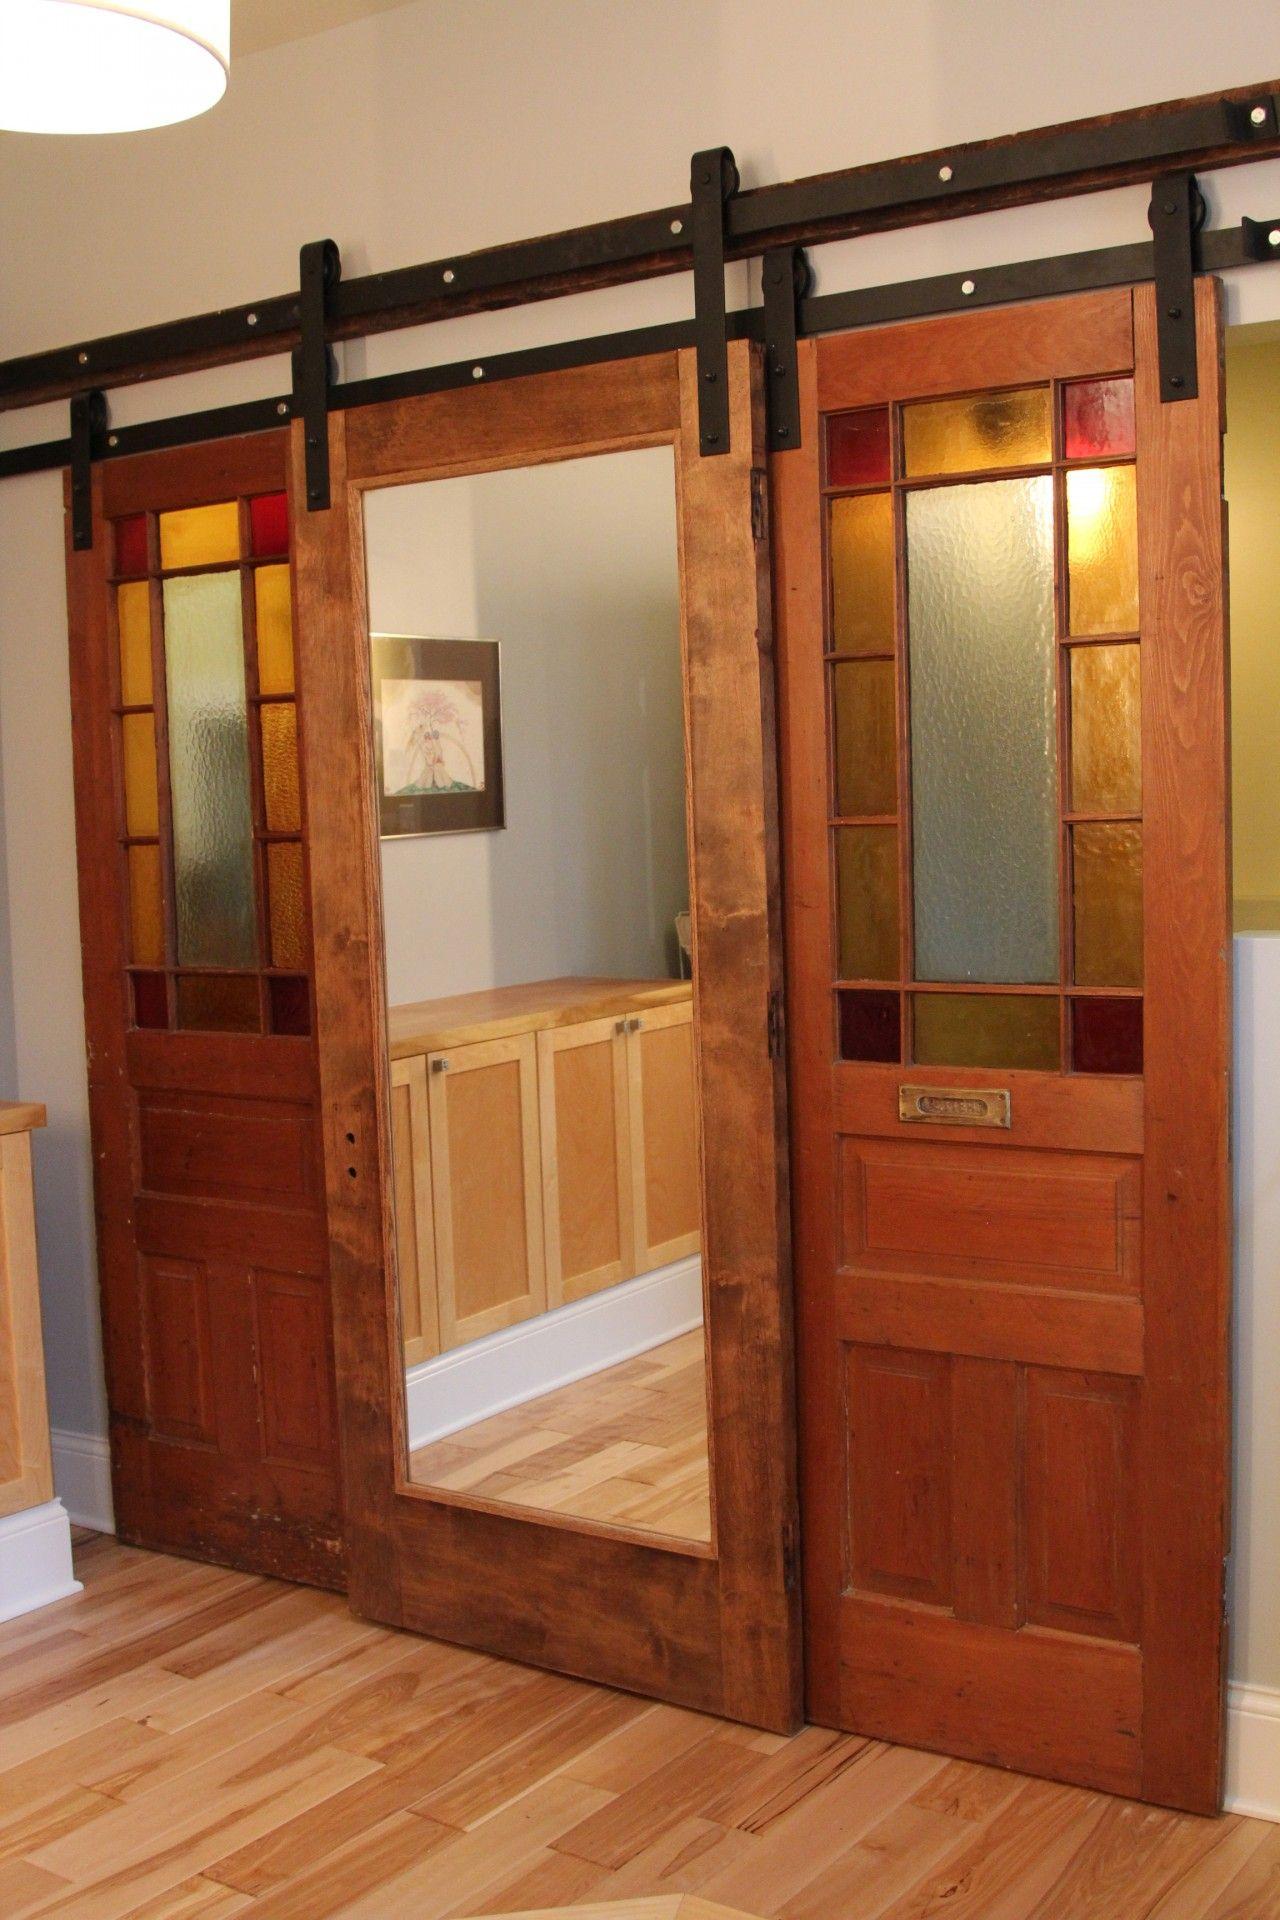 Sliding barn doors between kitchen and living room! Barn